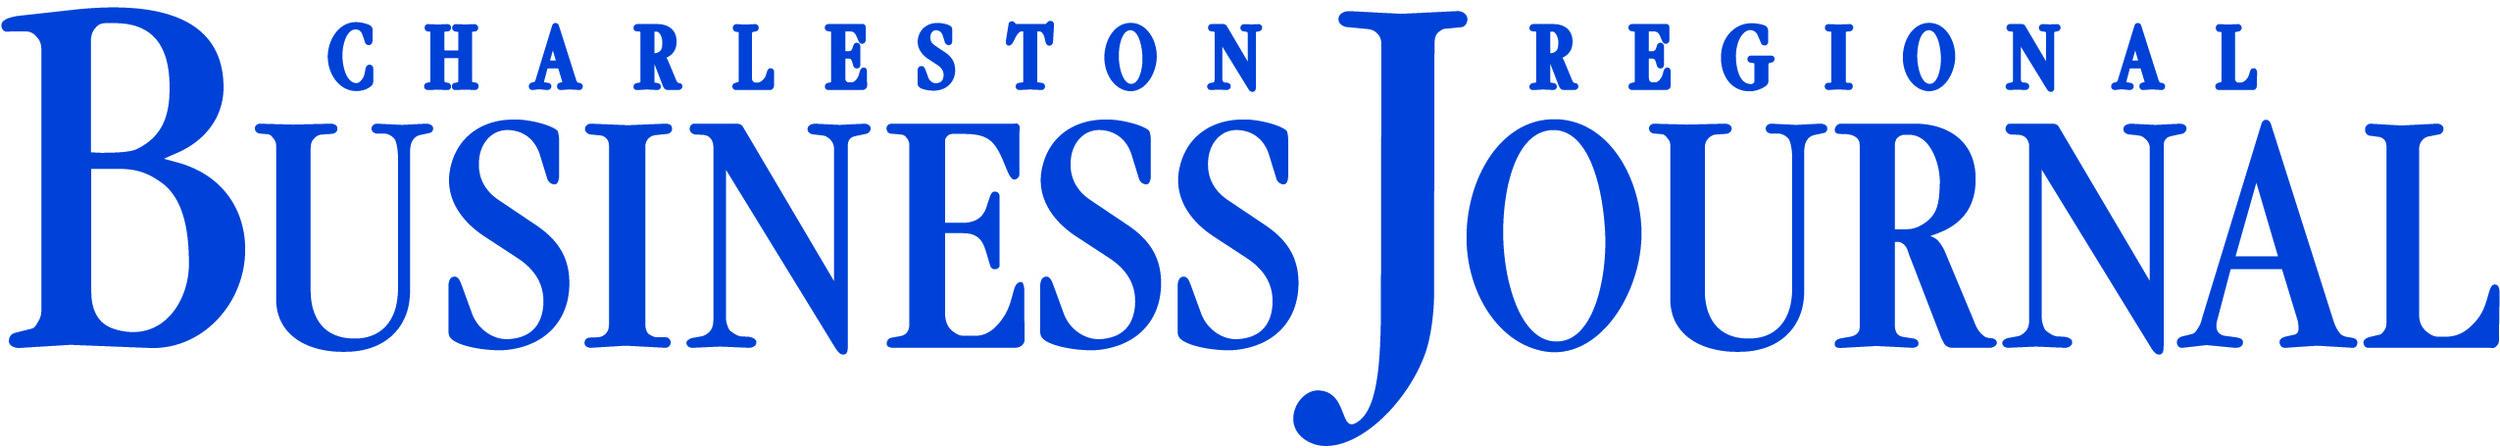 Business Journal LOGO.JPG